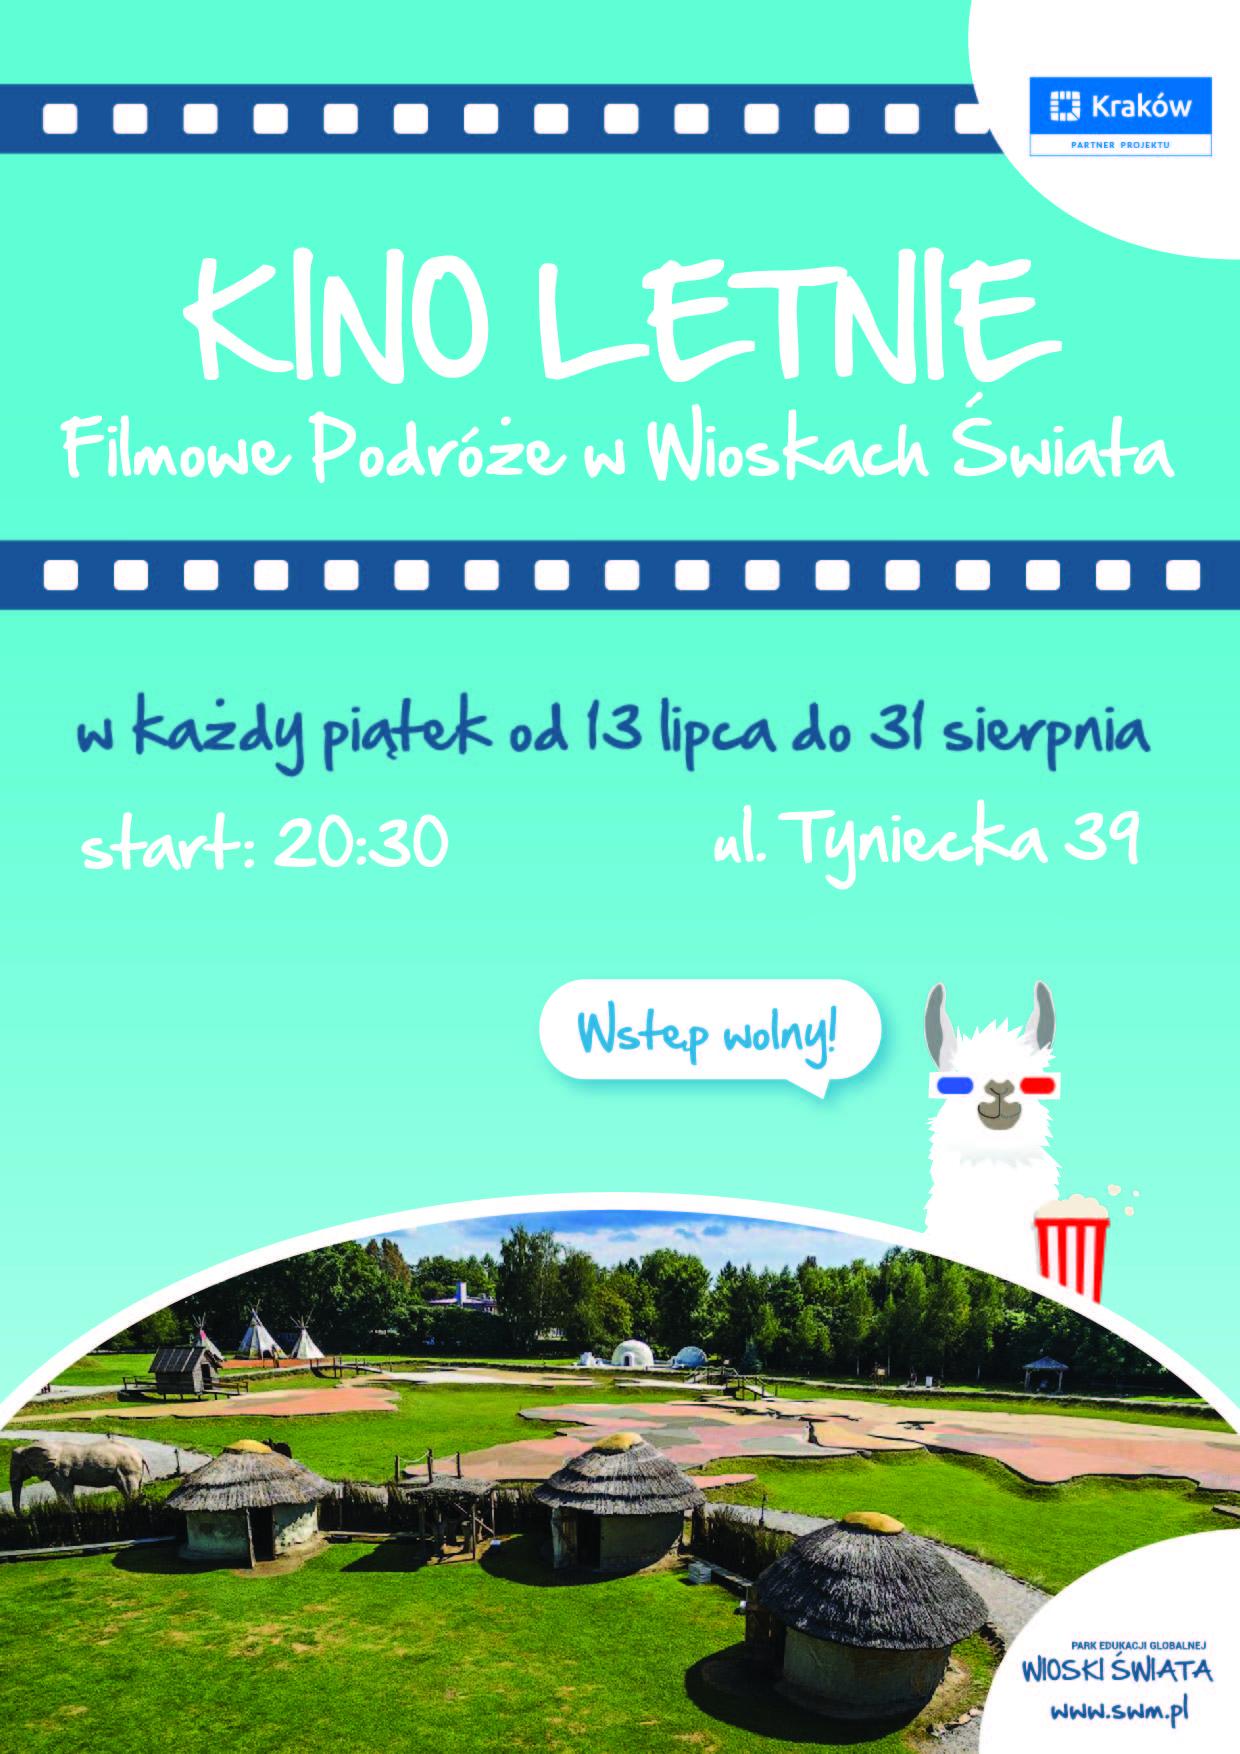 kino-letnie-wioski-swiata